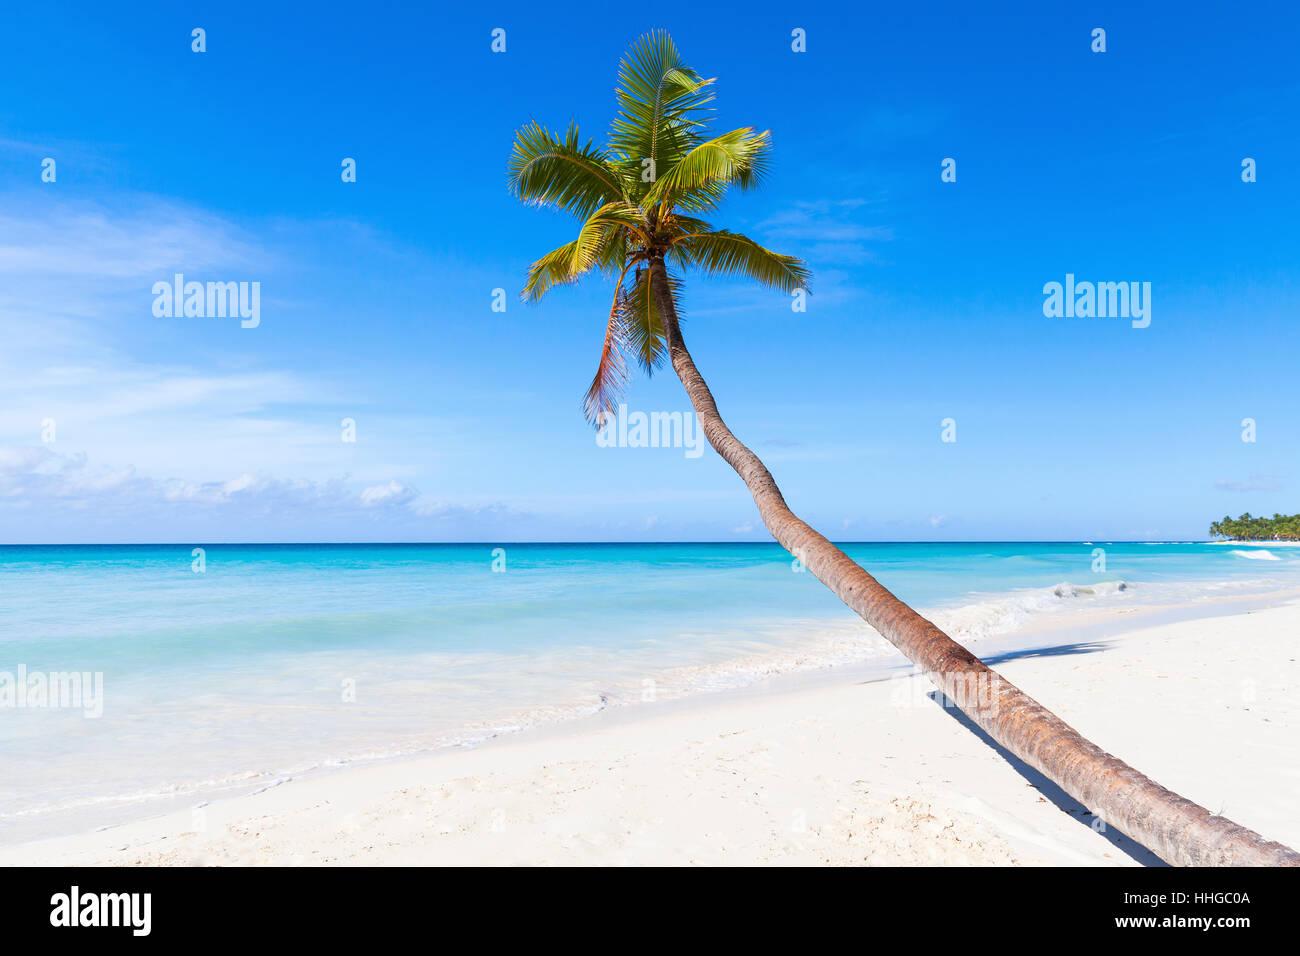 Caribbean Sea, Dominican republic, Saona island. Coconut palm grows on white sandy beach - Stock Image